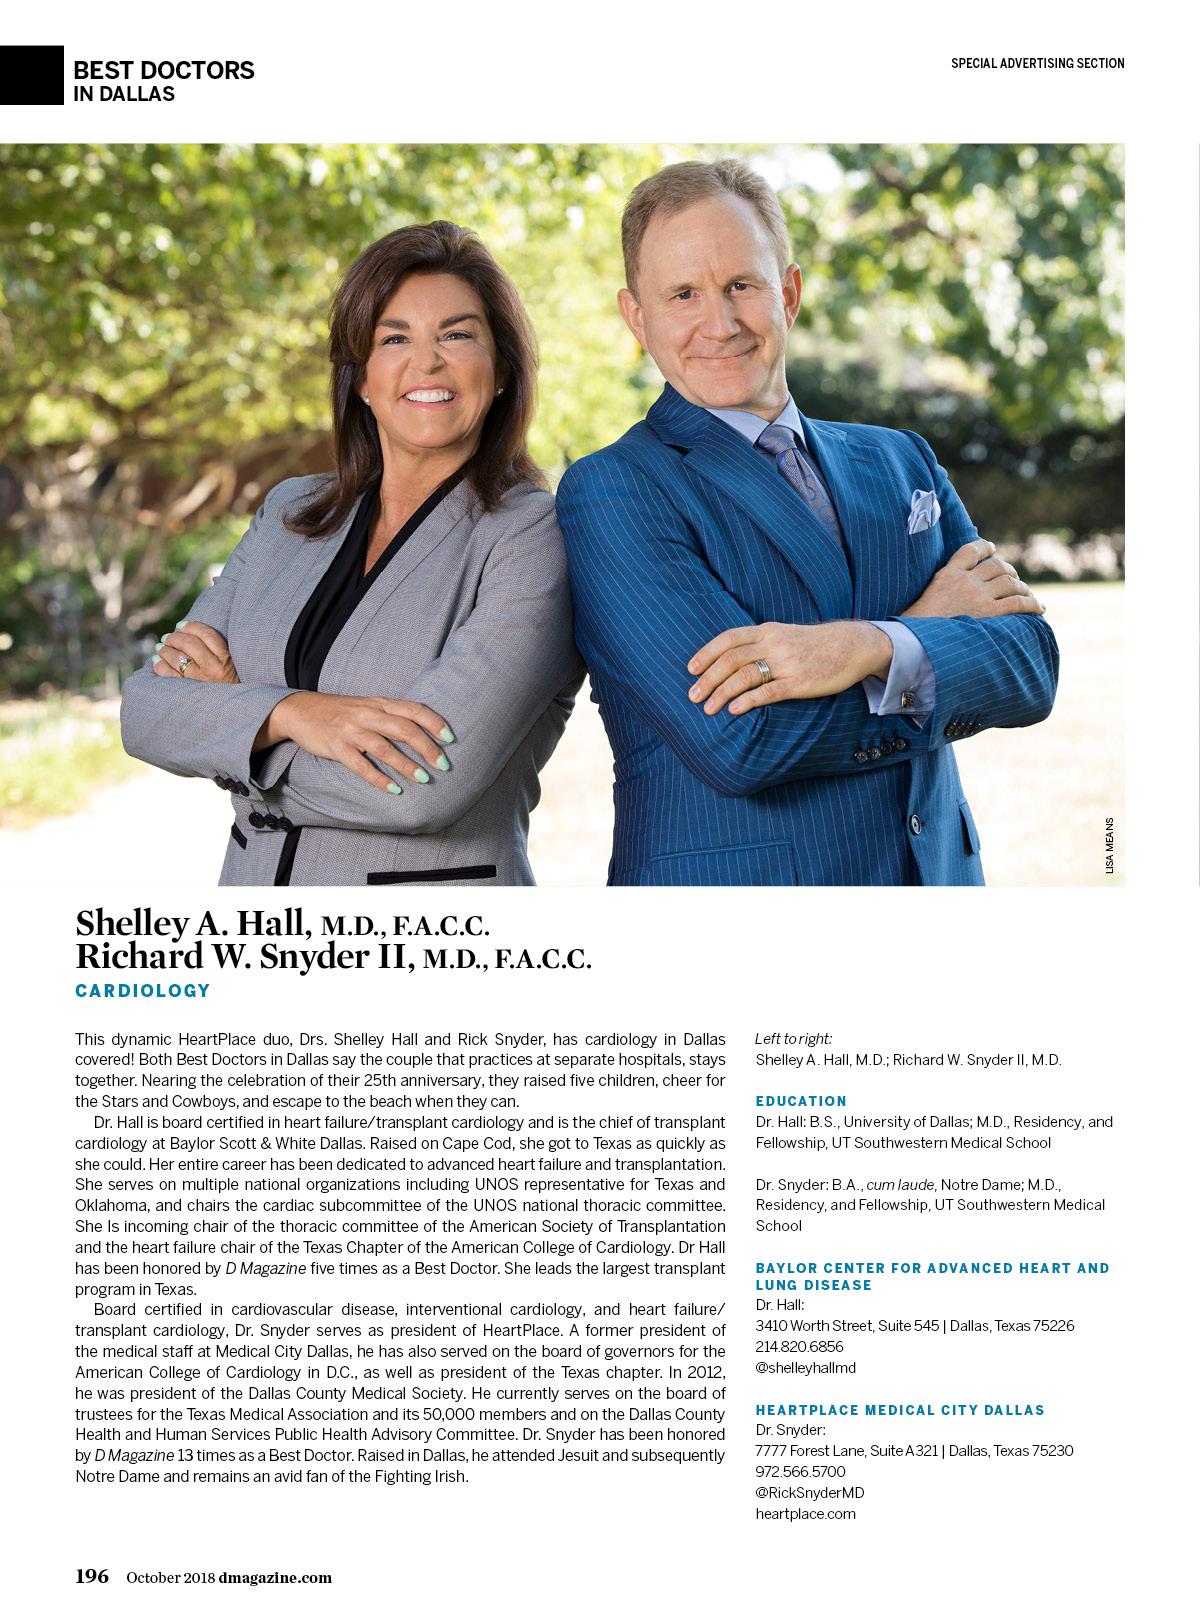 Richard Snyder II, M D , F A C C  - Cardiology - Dallas | D Magazine